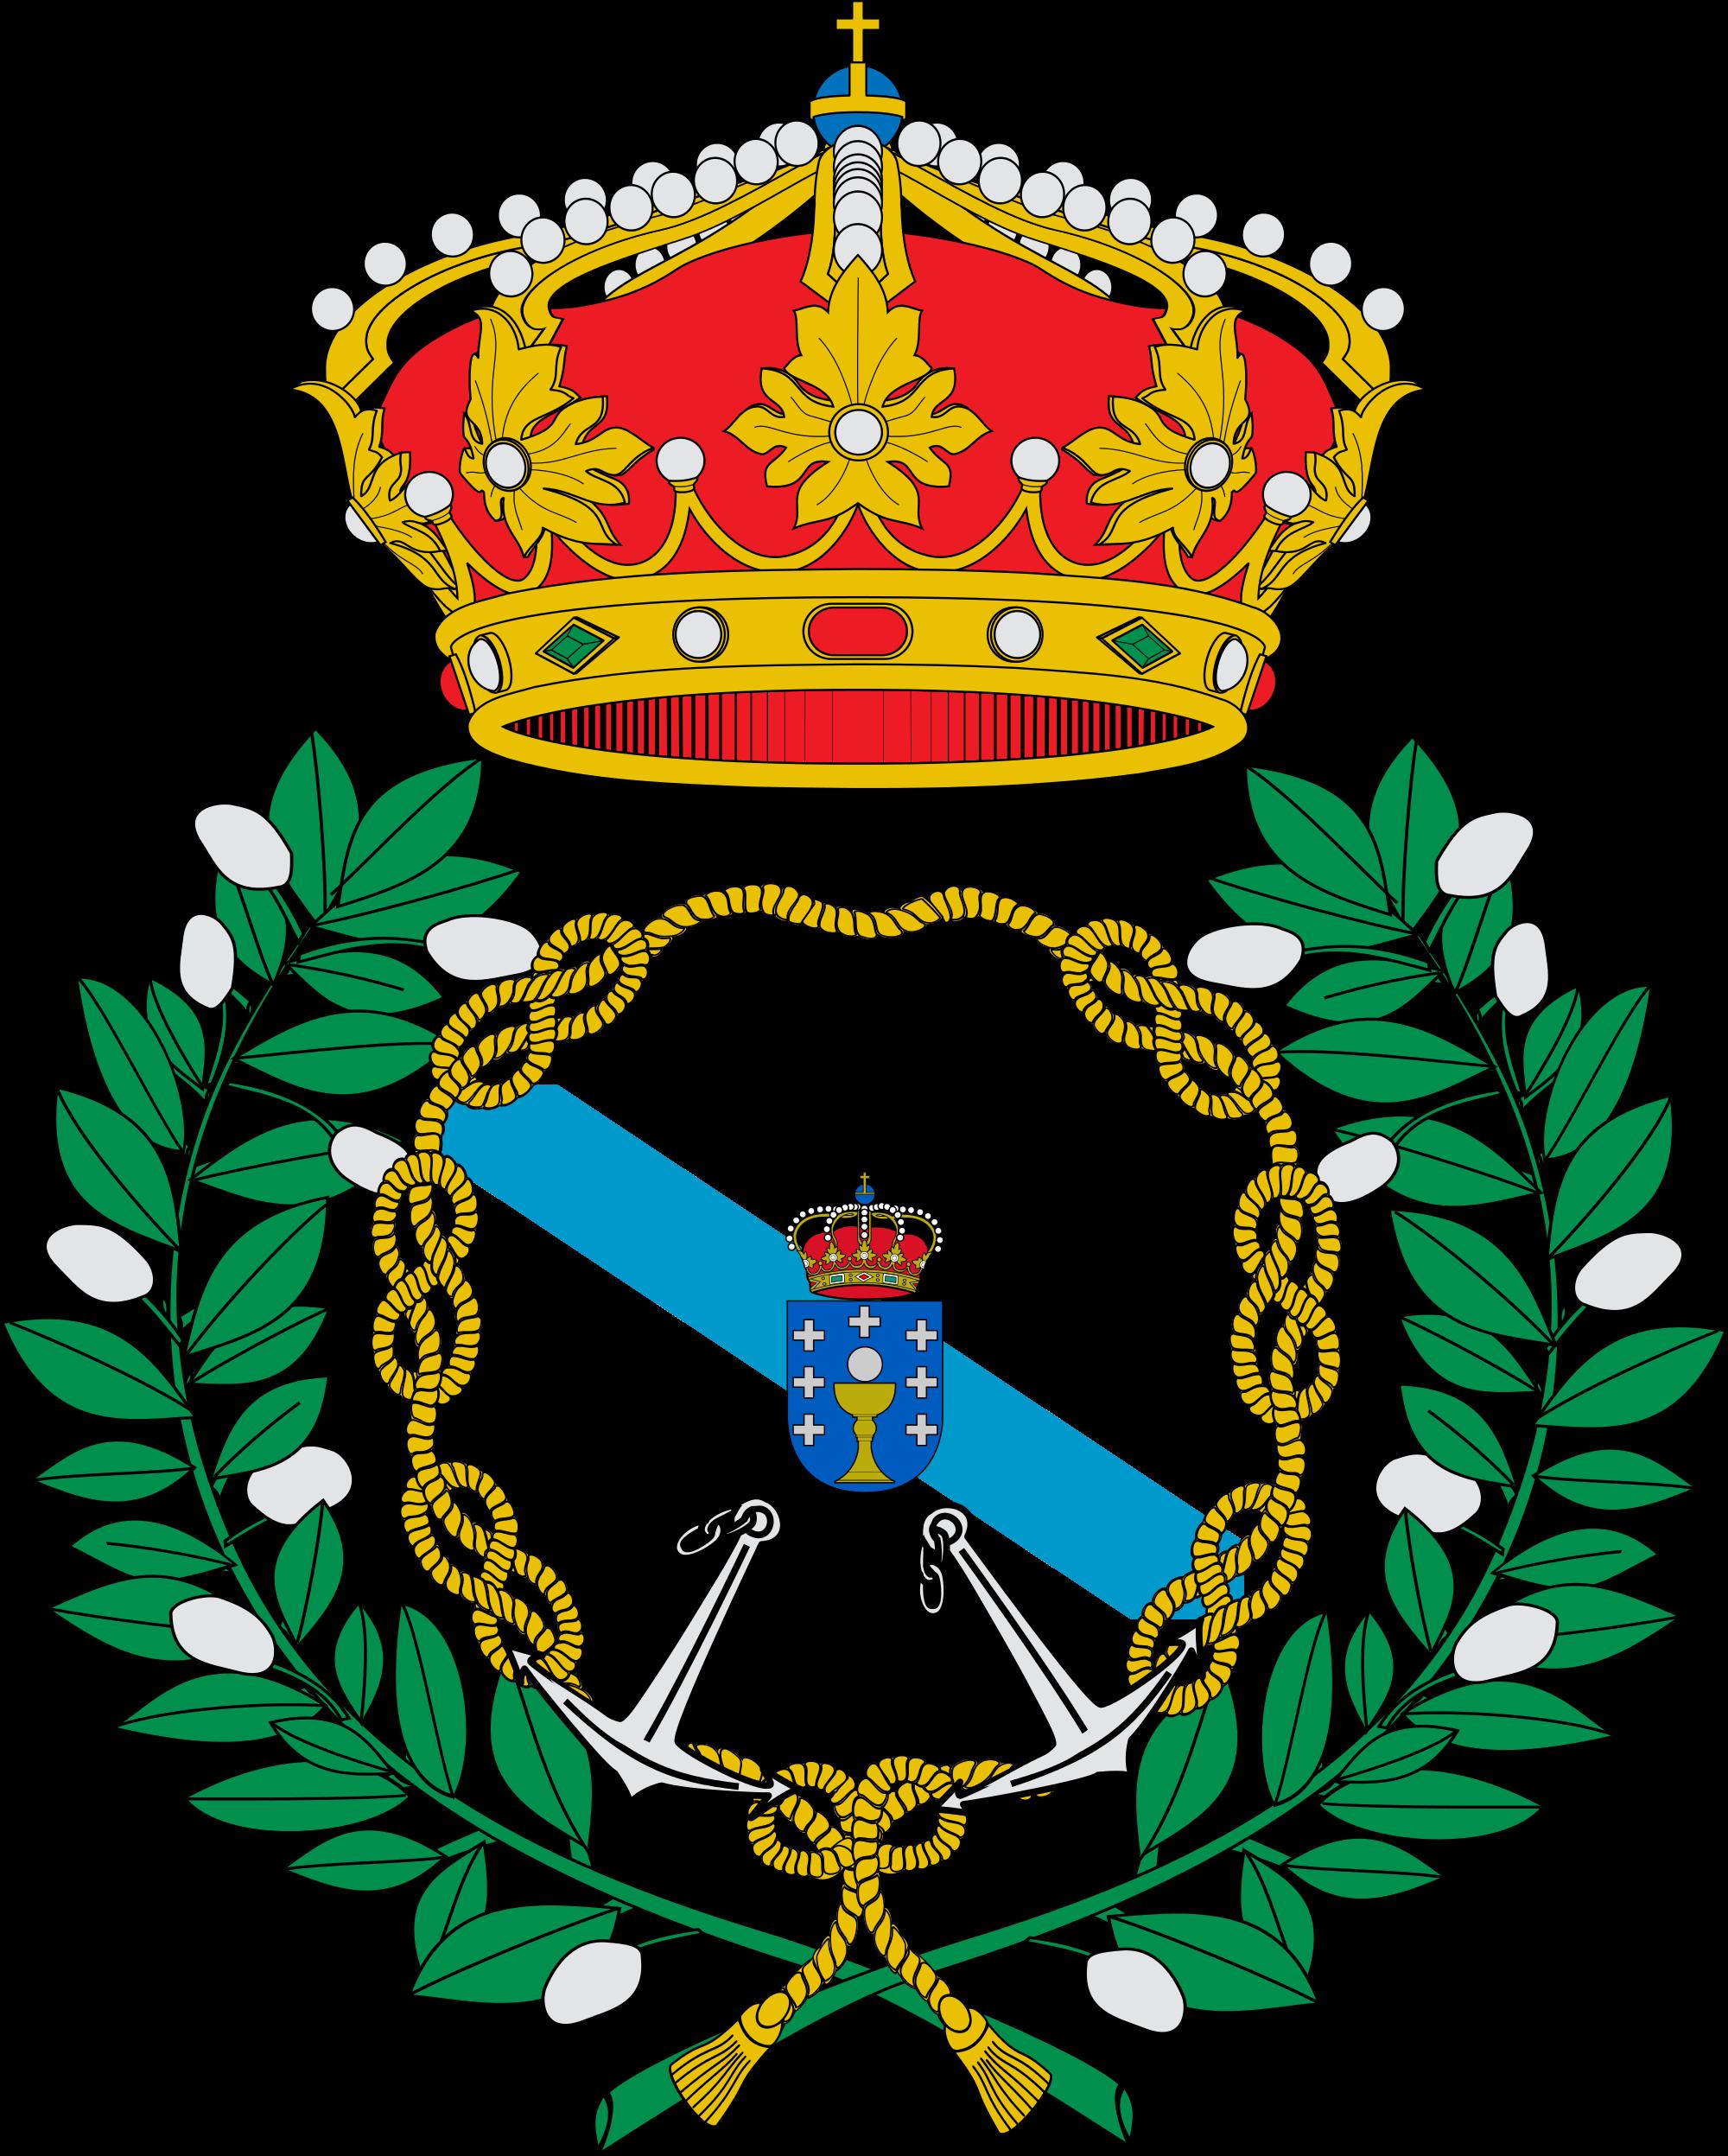 http://gardacostas.xunta.gal/es